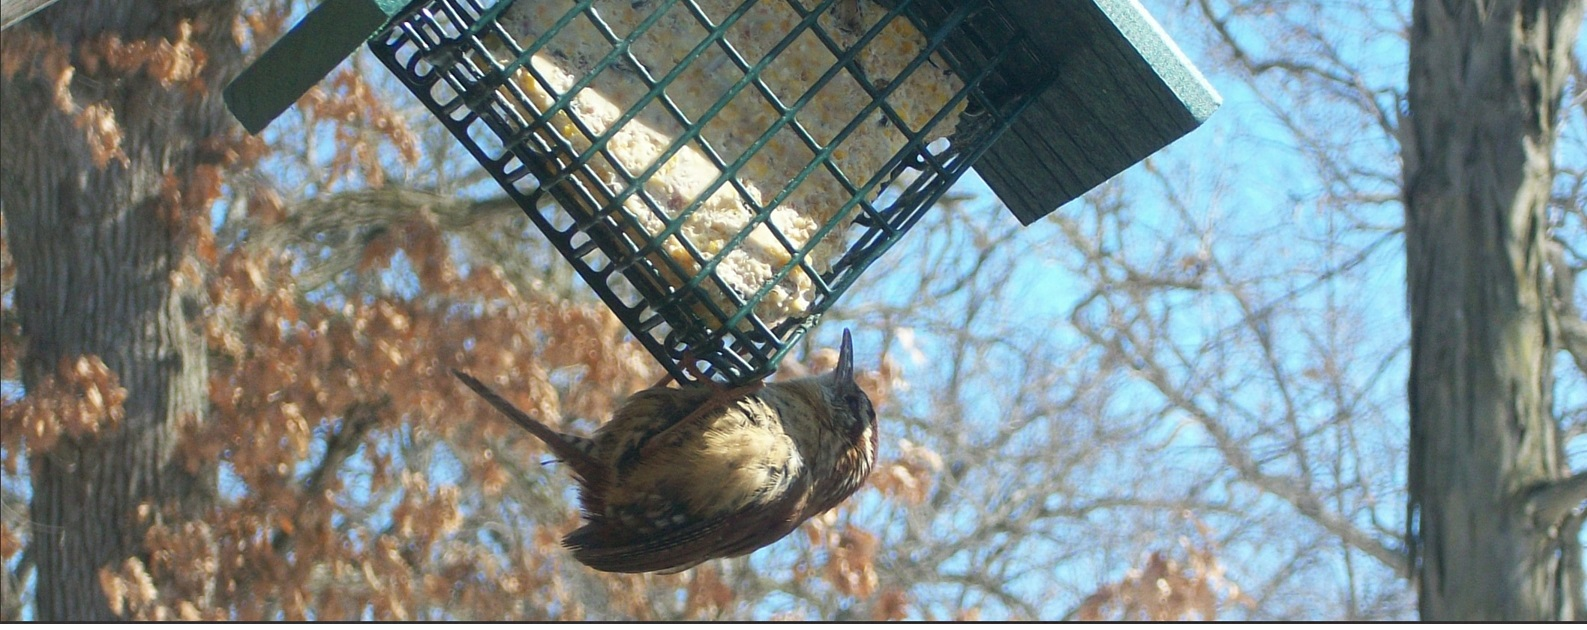 Great Backyard Bird Count   Scott County, Iowa